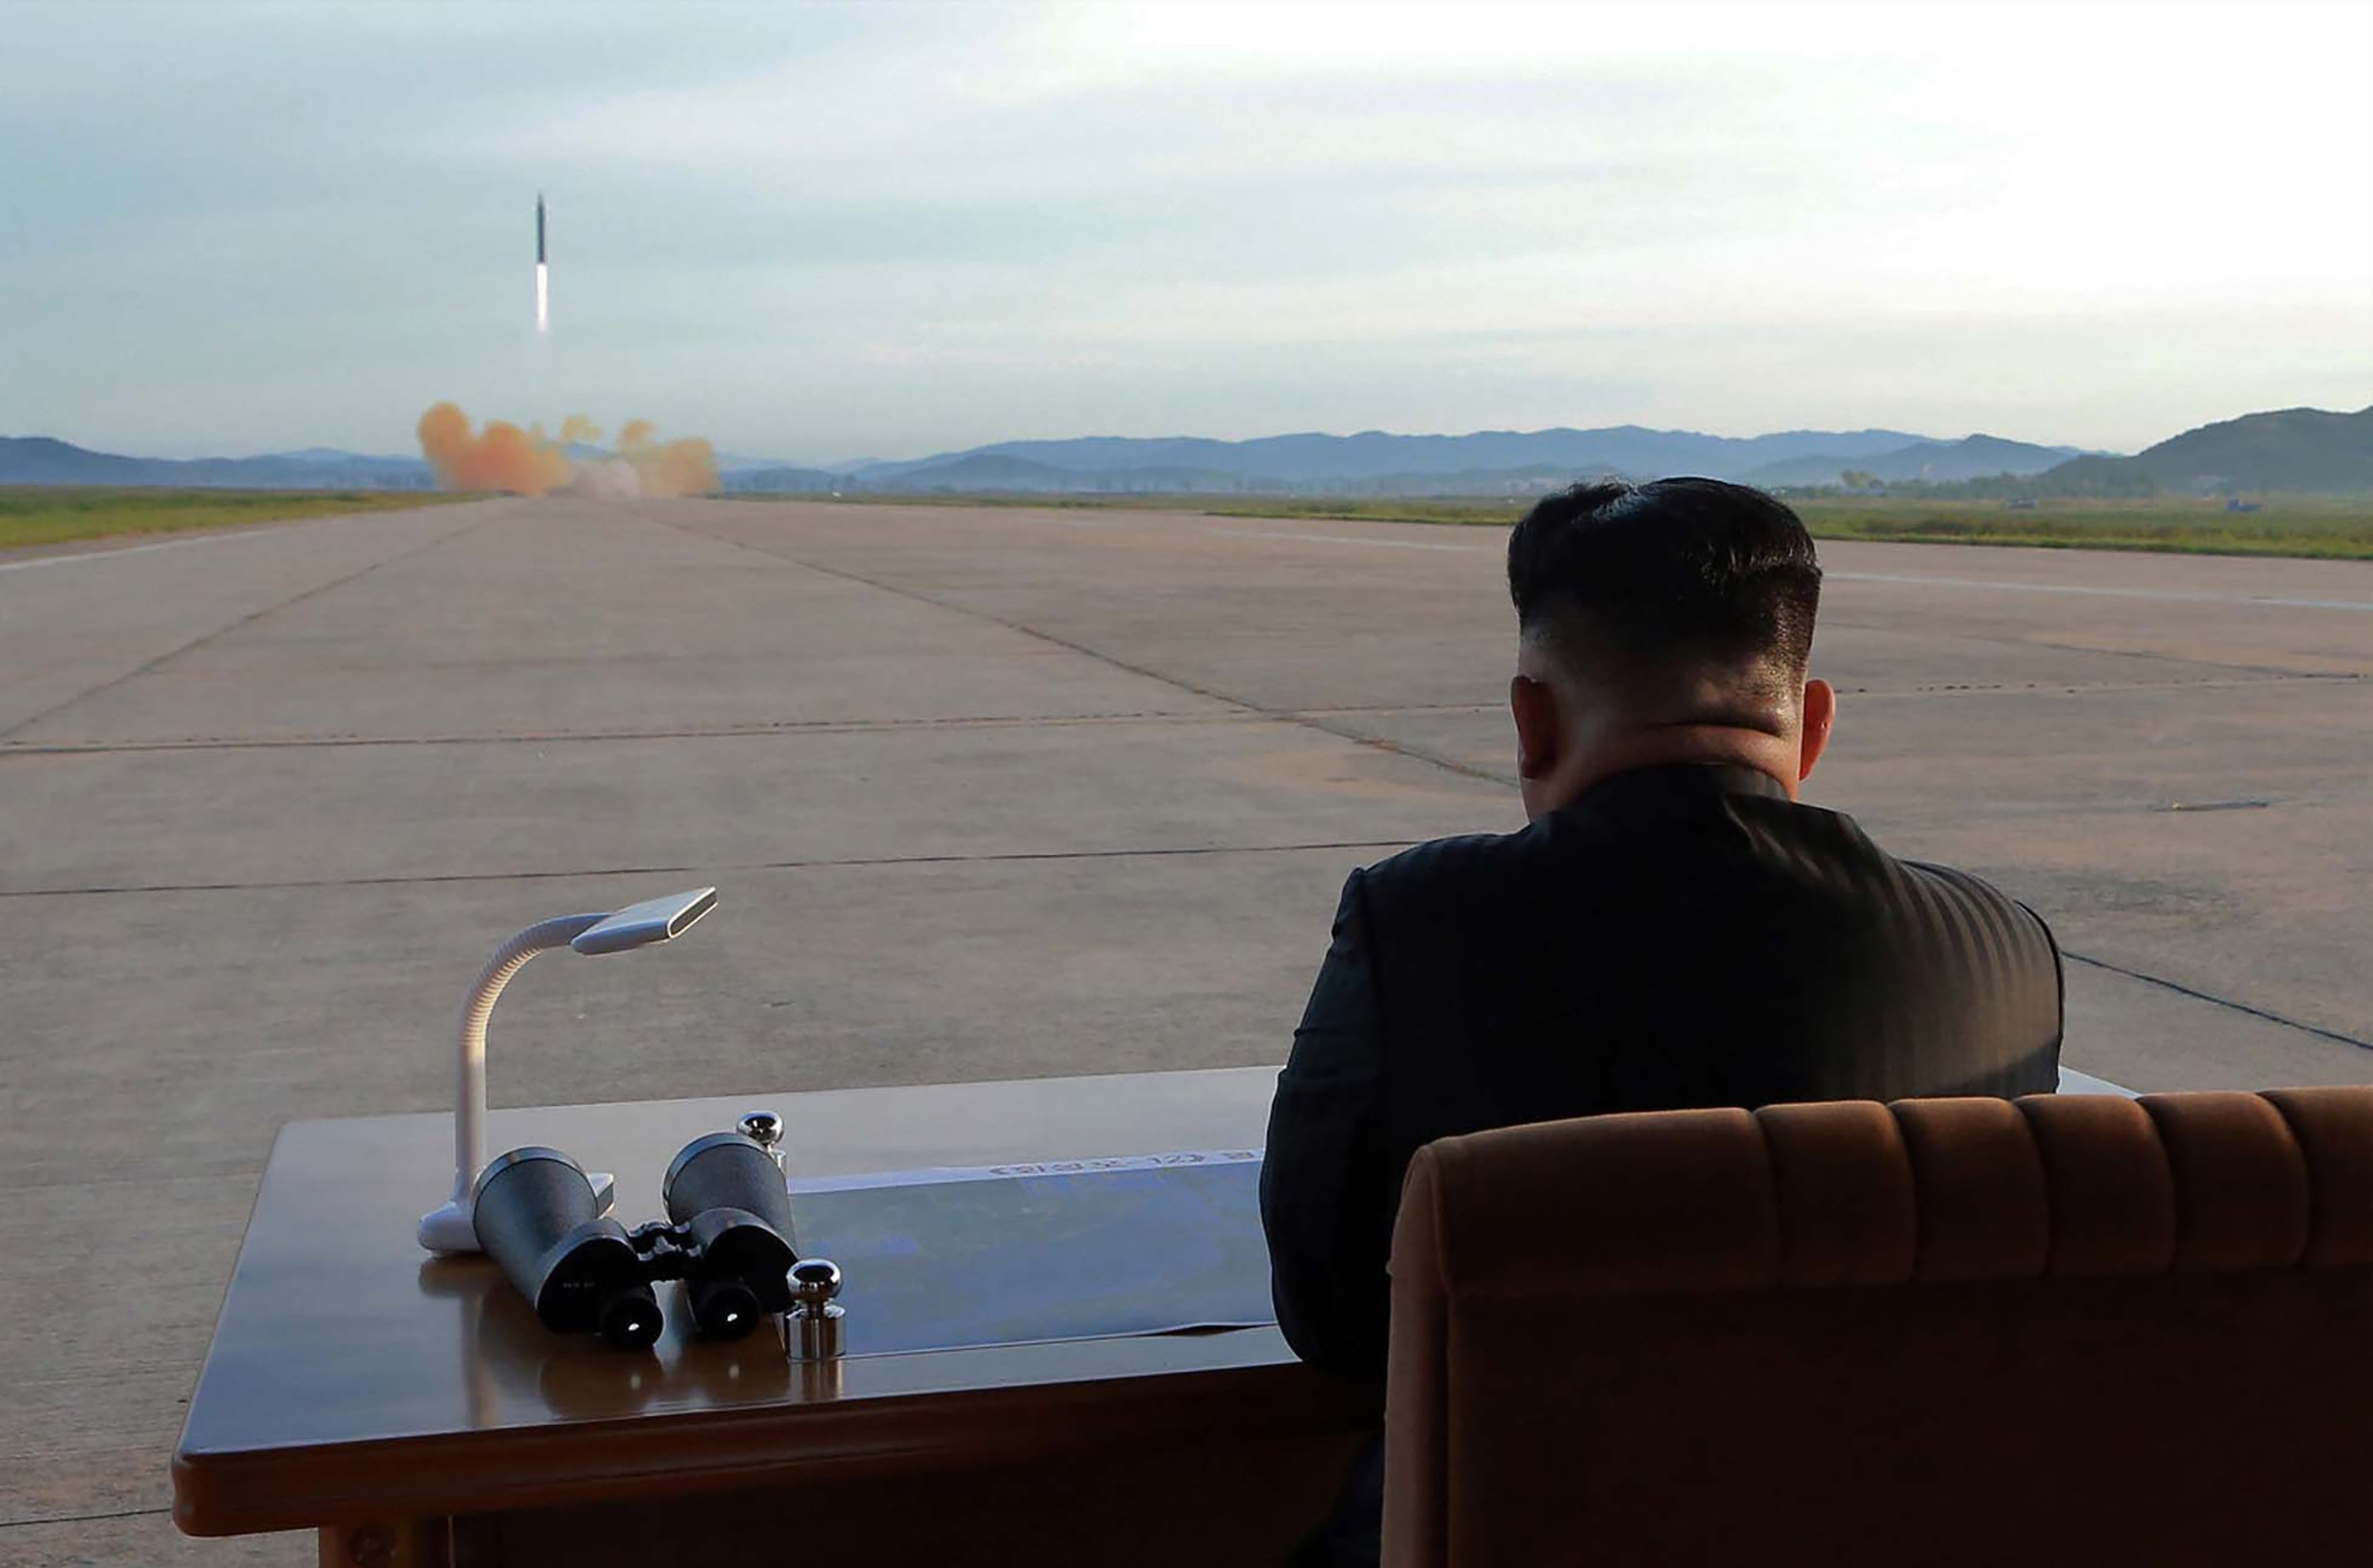 28_09_North_Korea_war_more_likely_Trump